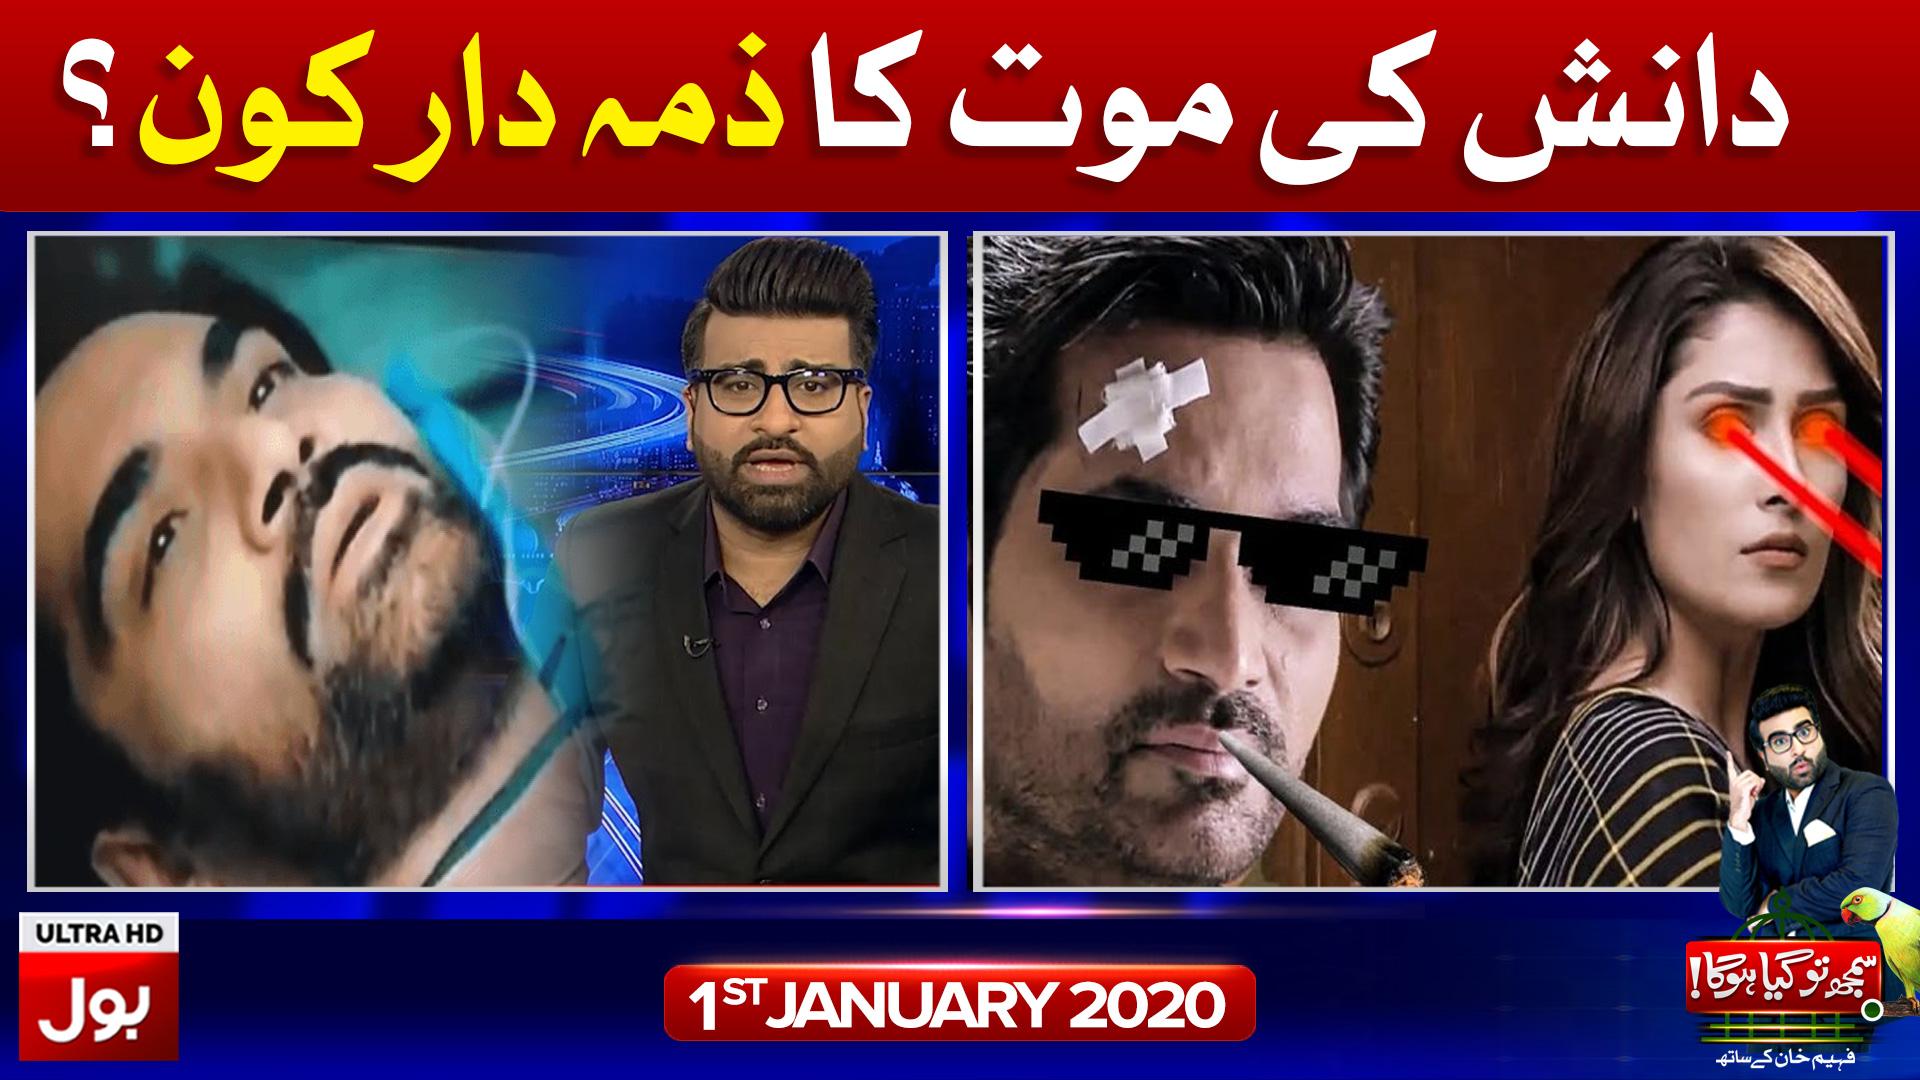 Samajh Tou Gaya Hoga Comedy Show Full Episode | 1st Feb 2020 | BOL News